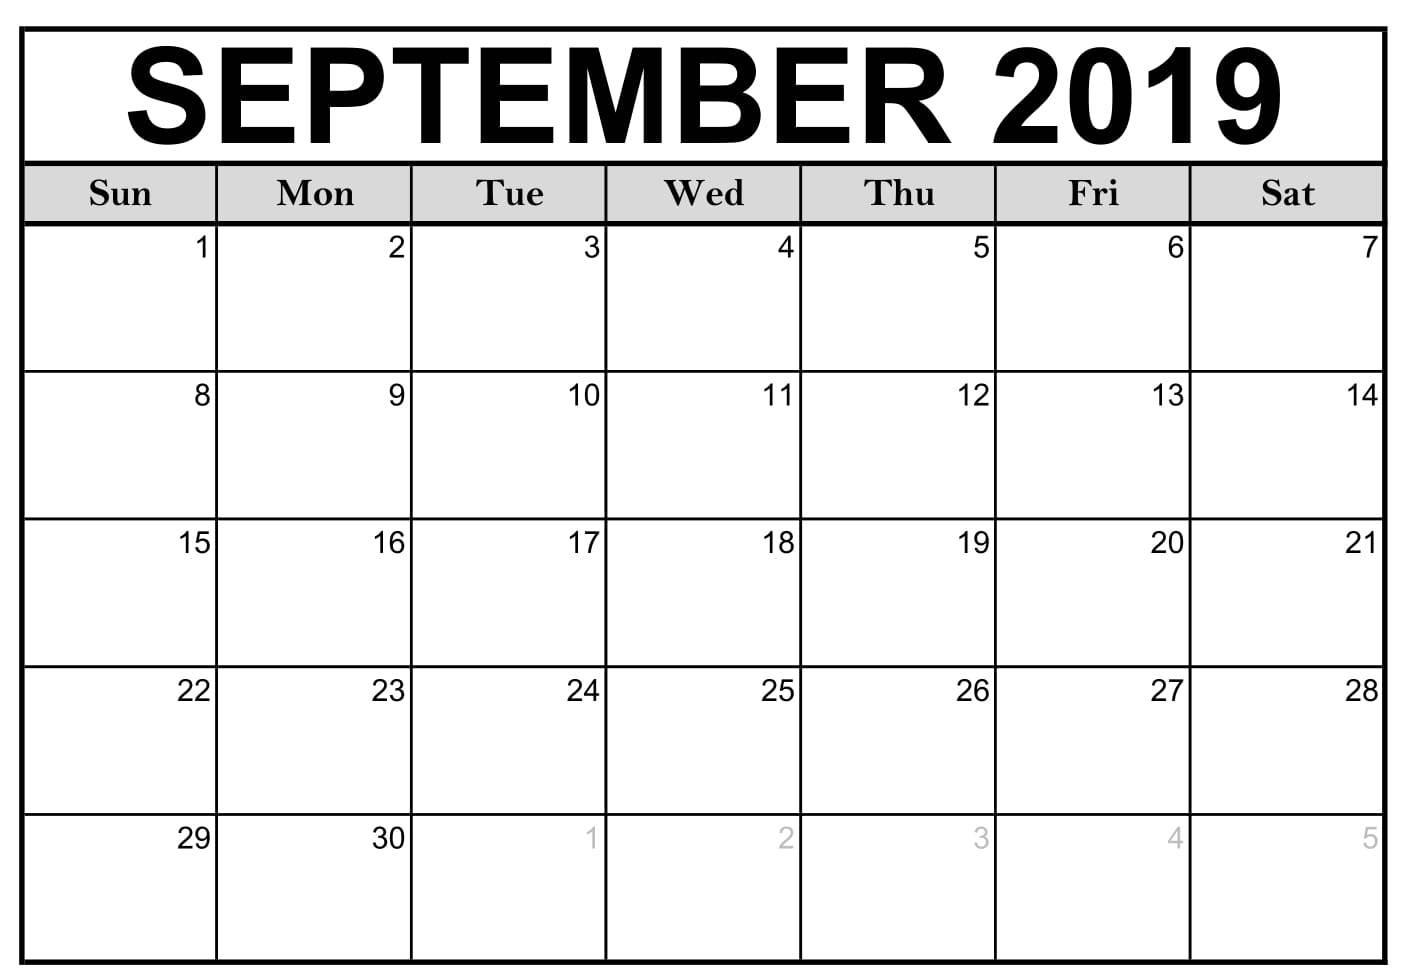 Printable September 2019 Calendar Pdf Free Template - July 2019 intended for Blank Printable September Calendar